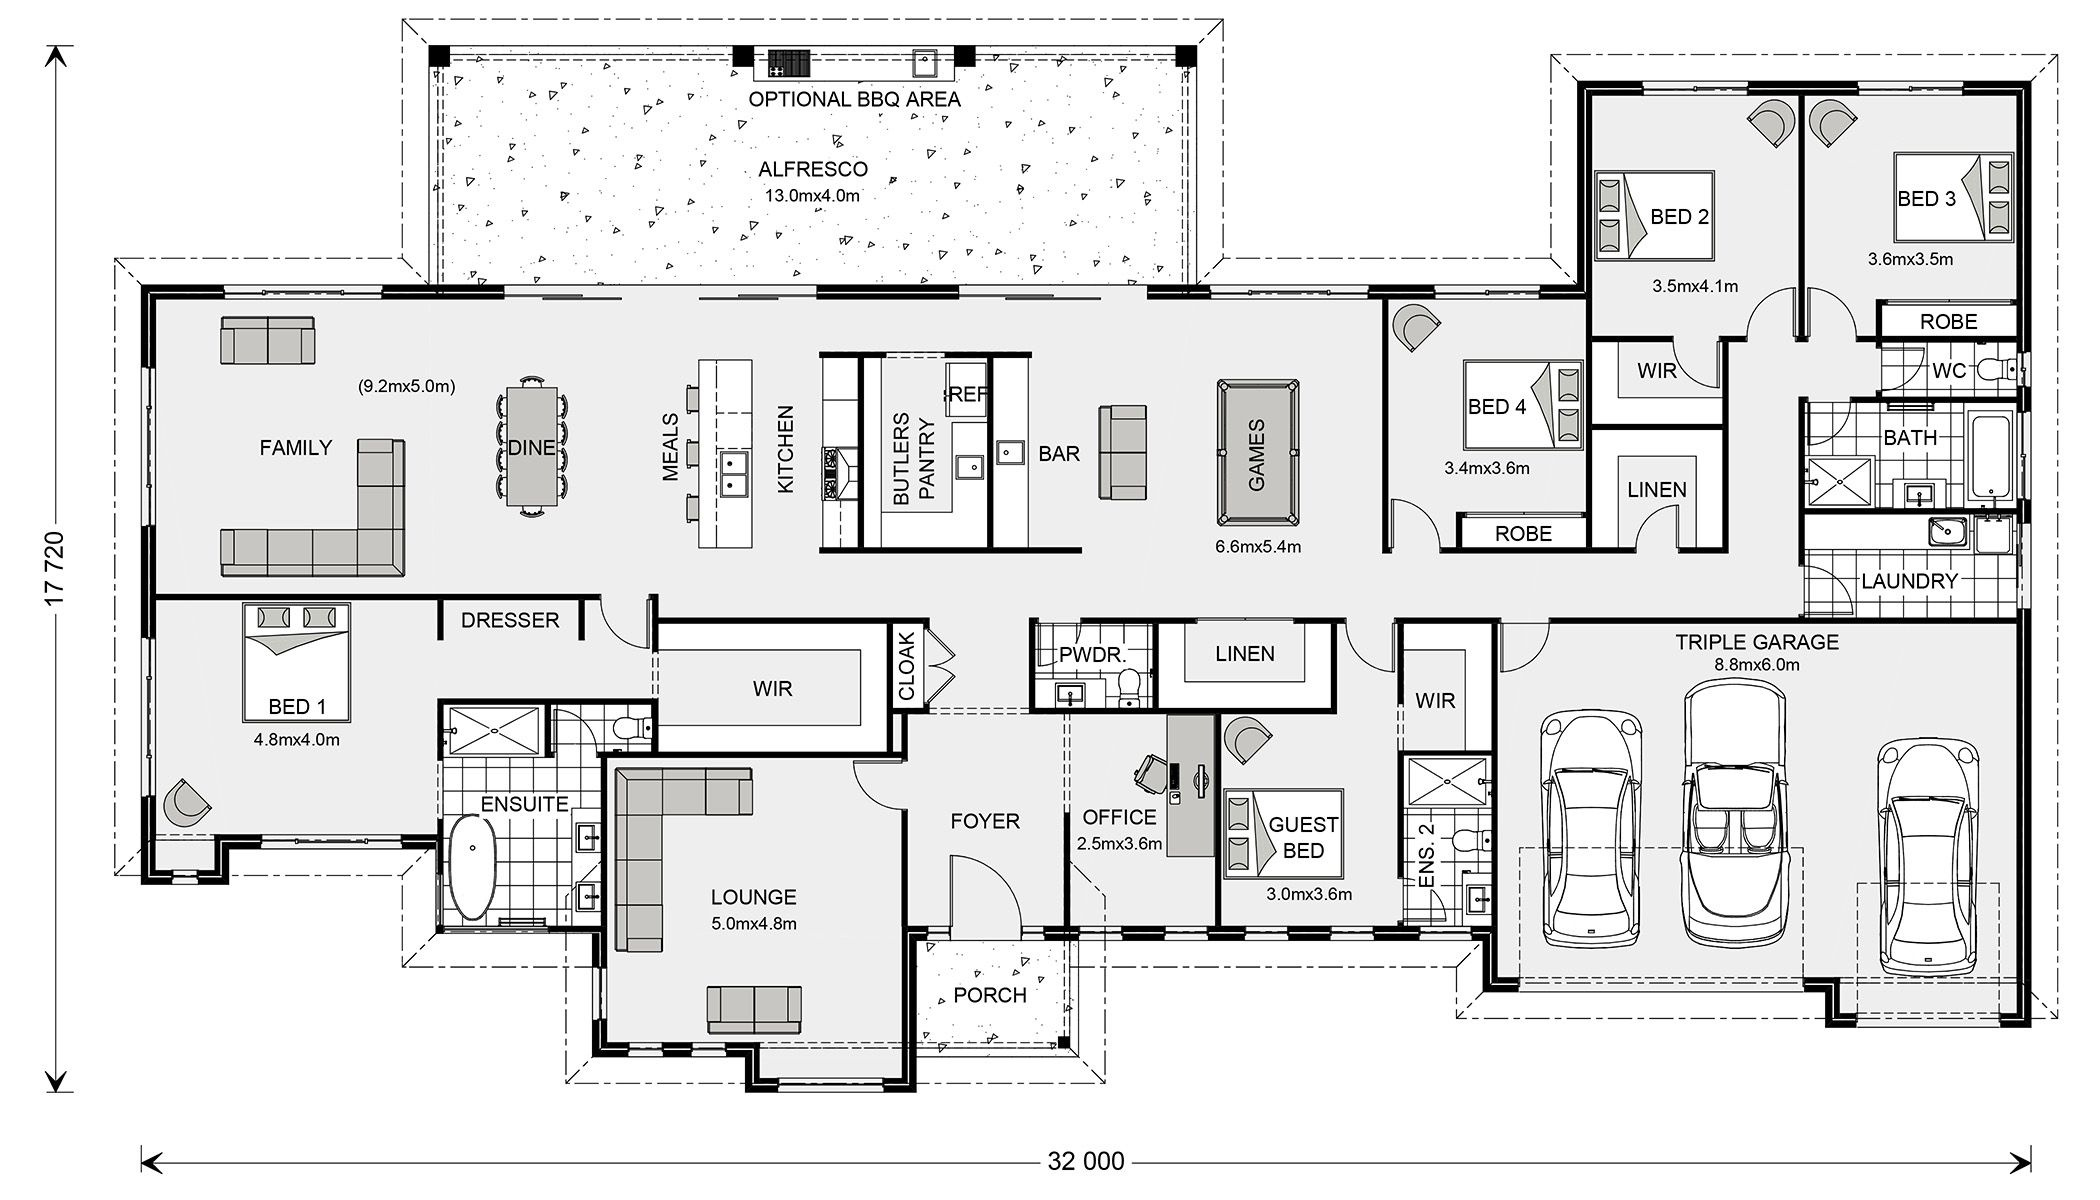 Wentworth 455, Home Designs in Melbourne South East | G.J. Gardner ...